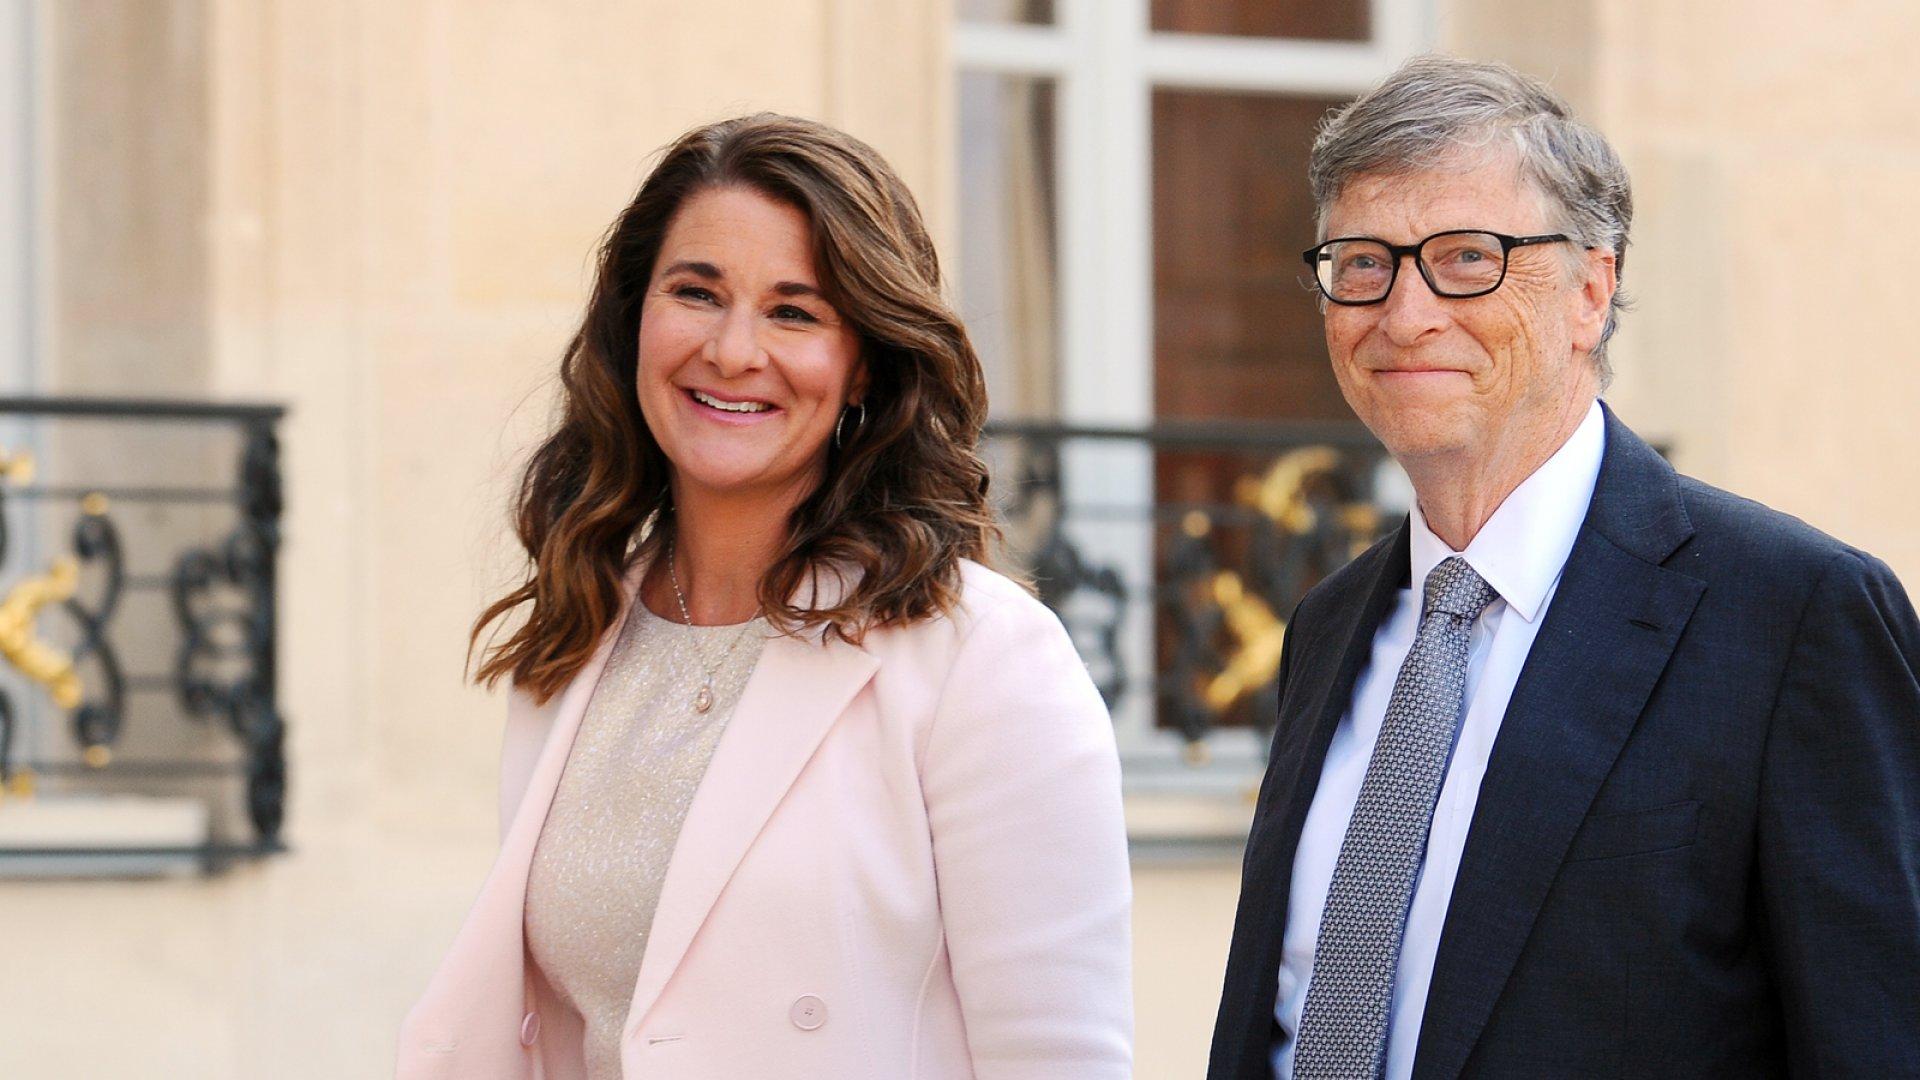 Bill Gates បានបរិច្ចាគភាគហ៊ុនរបស់ក្រុមហ៊ុន Microsoft ចំនួន ៣៥,៨ ពាន់លានដុល្លារដល់មូលនិធិ Gates